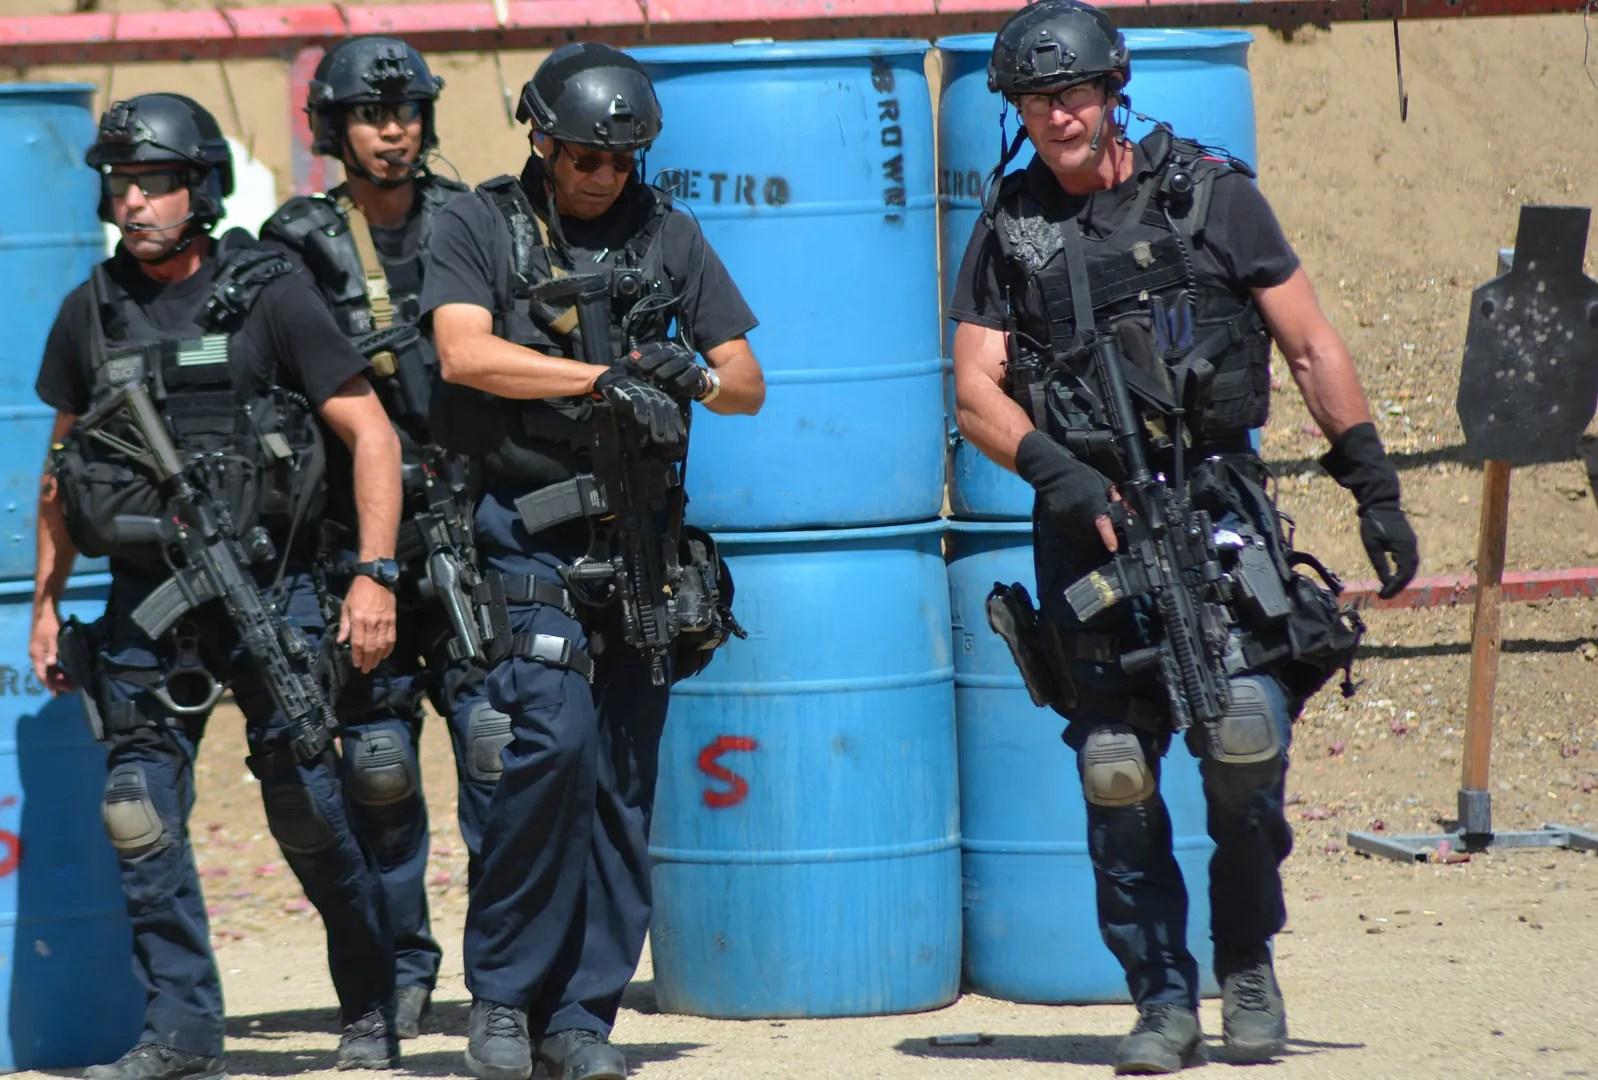 photo LAPD_SWAT_Exercise_1_zpsjmaw00qh.jpg